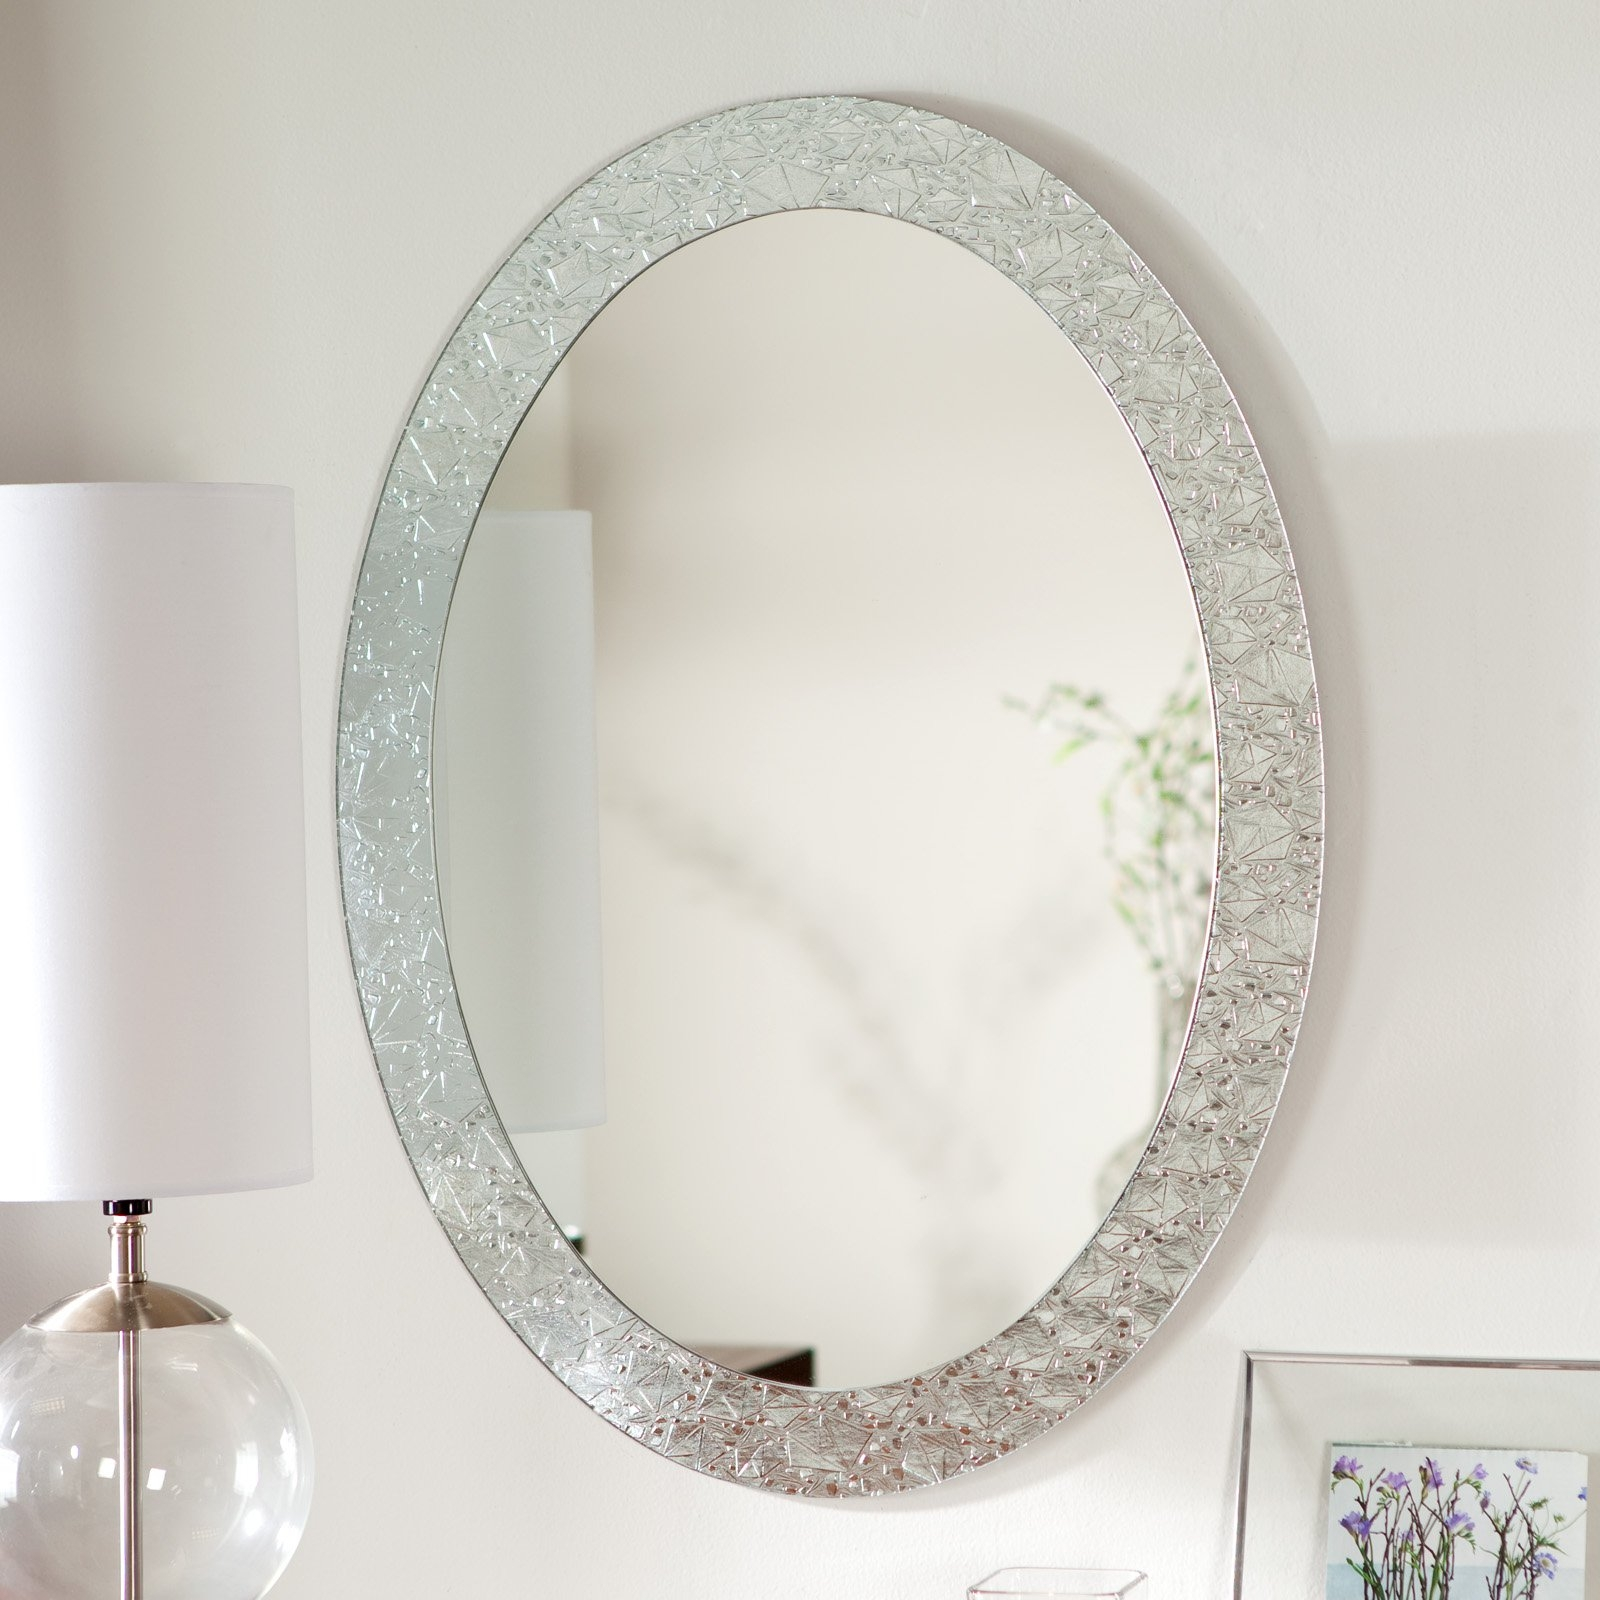 White Framed Oval Bathroom Mirrors